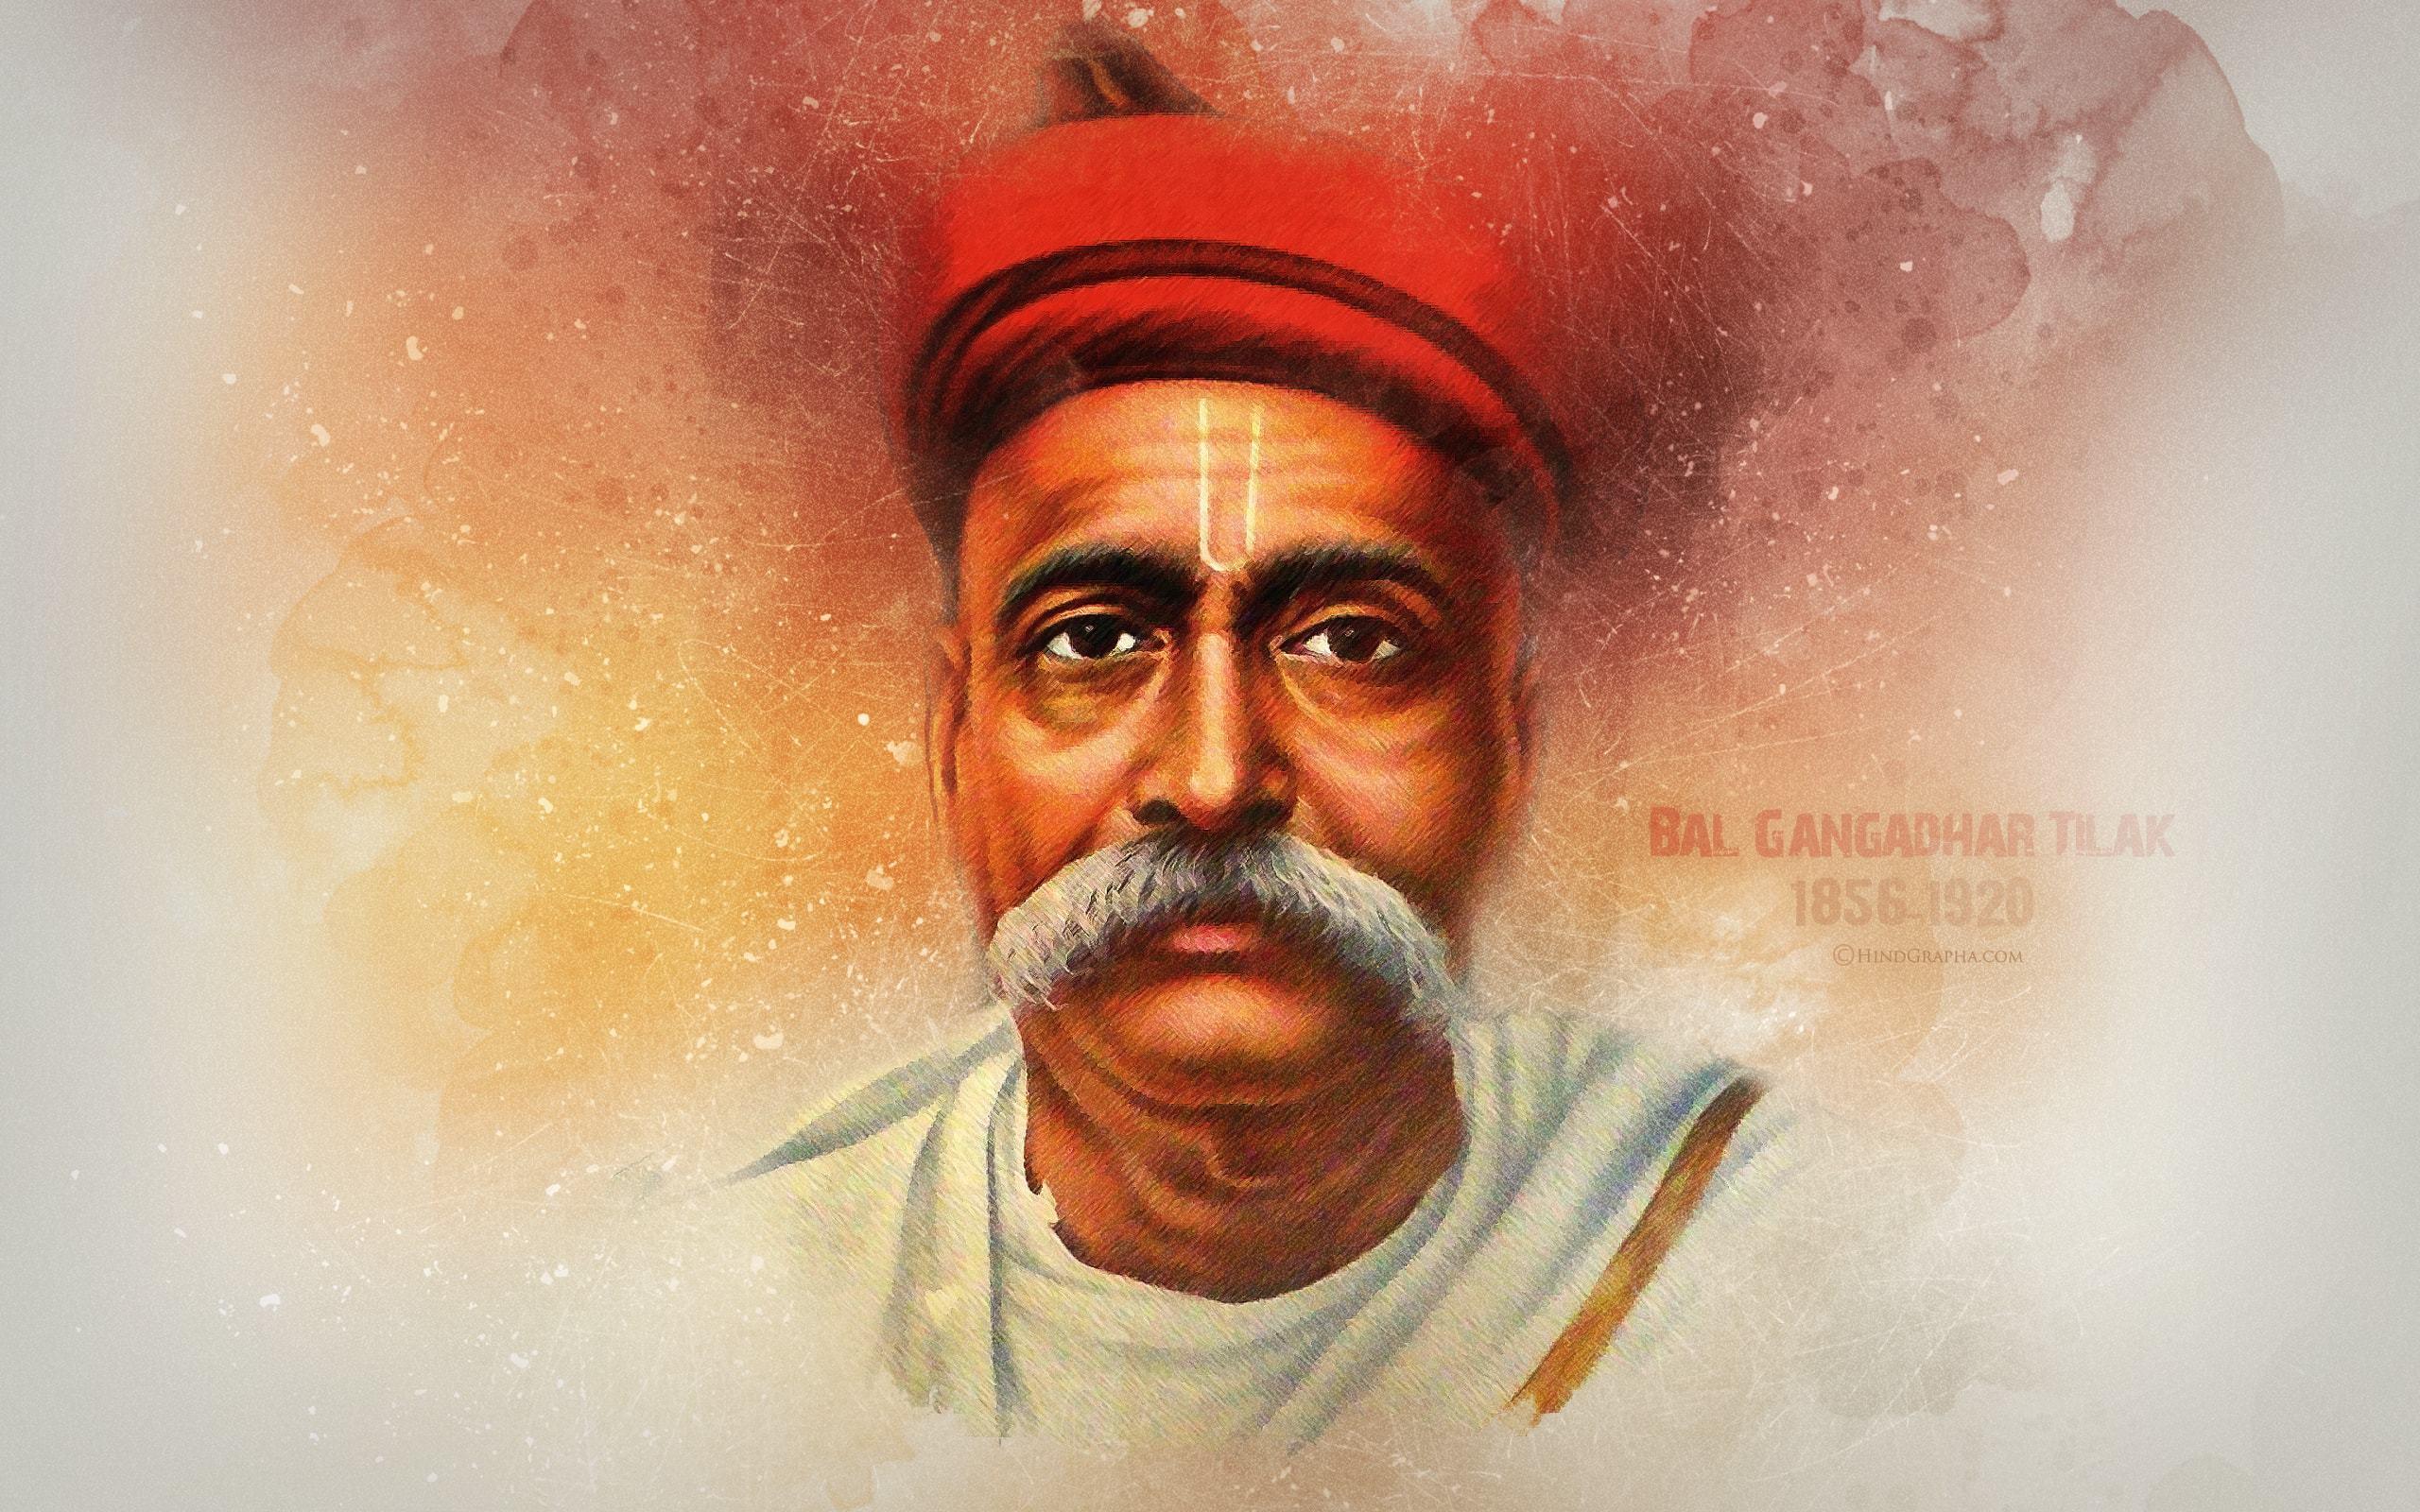 Bal Gangadhar Tilak Hd Wallpaper Hindgrapha - Bal Gangadhar Tilak Hd , HD Wallpaper & Backgrounds